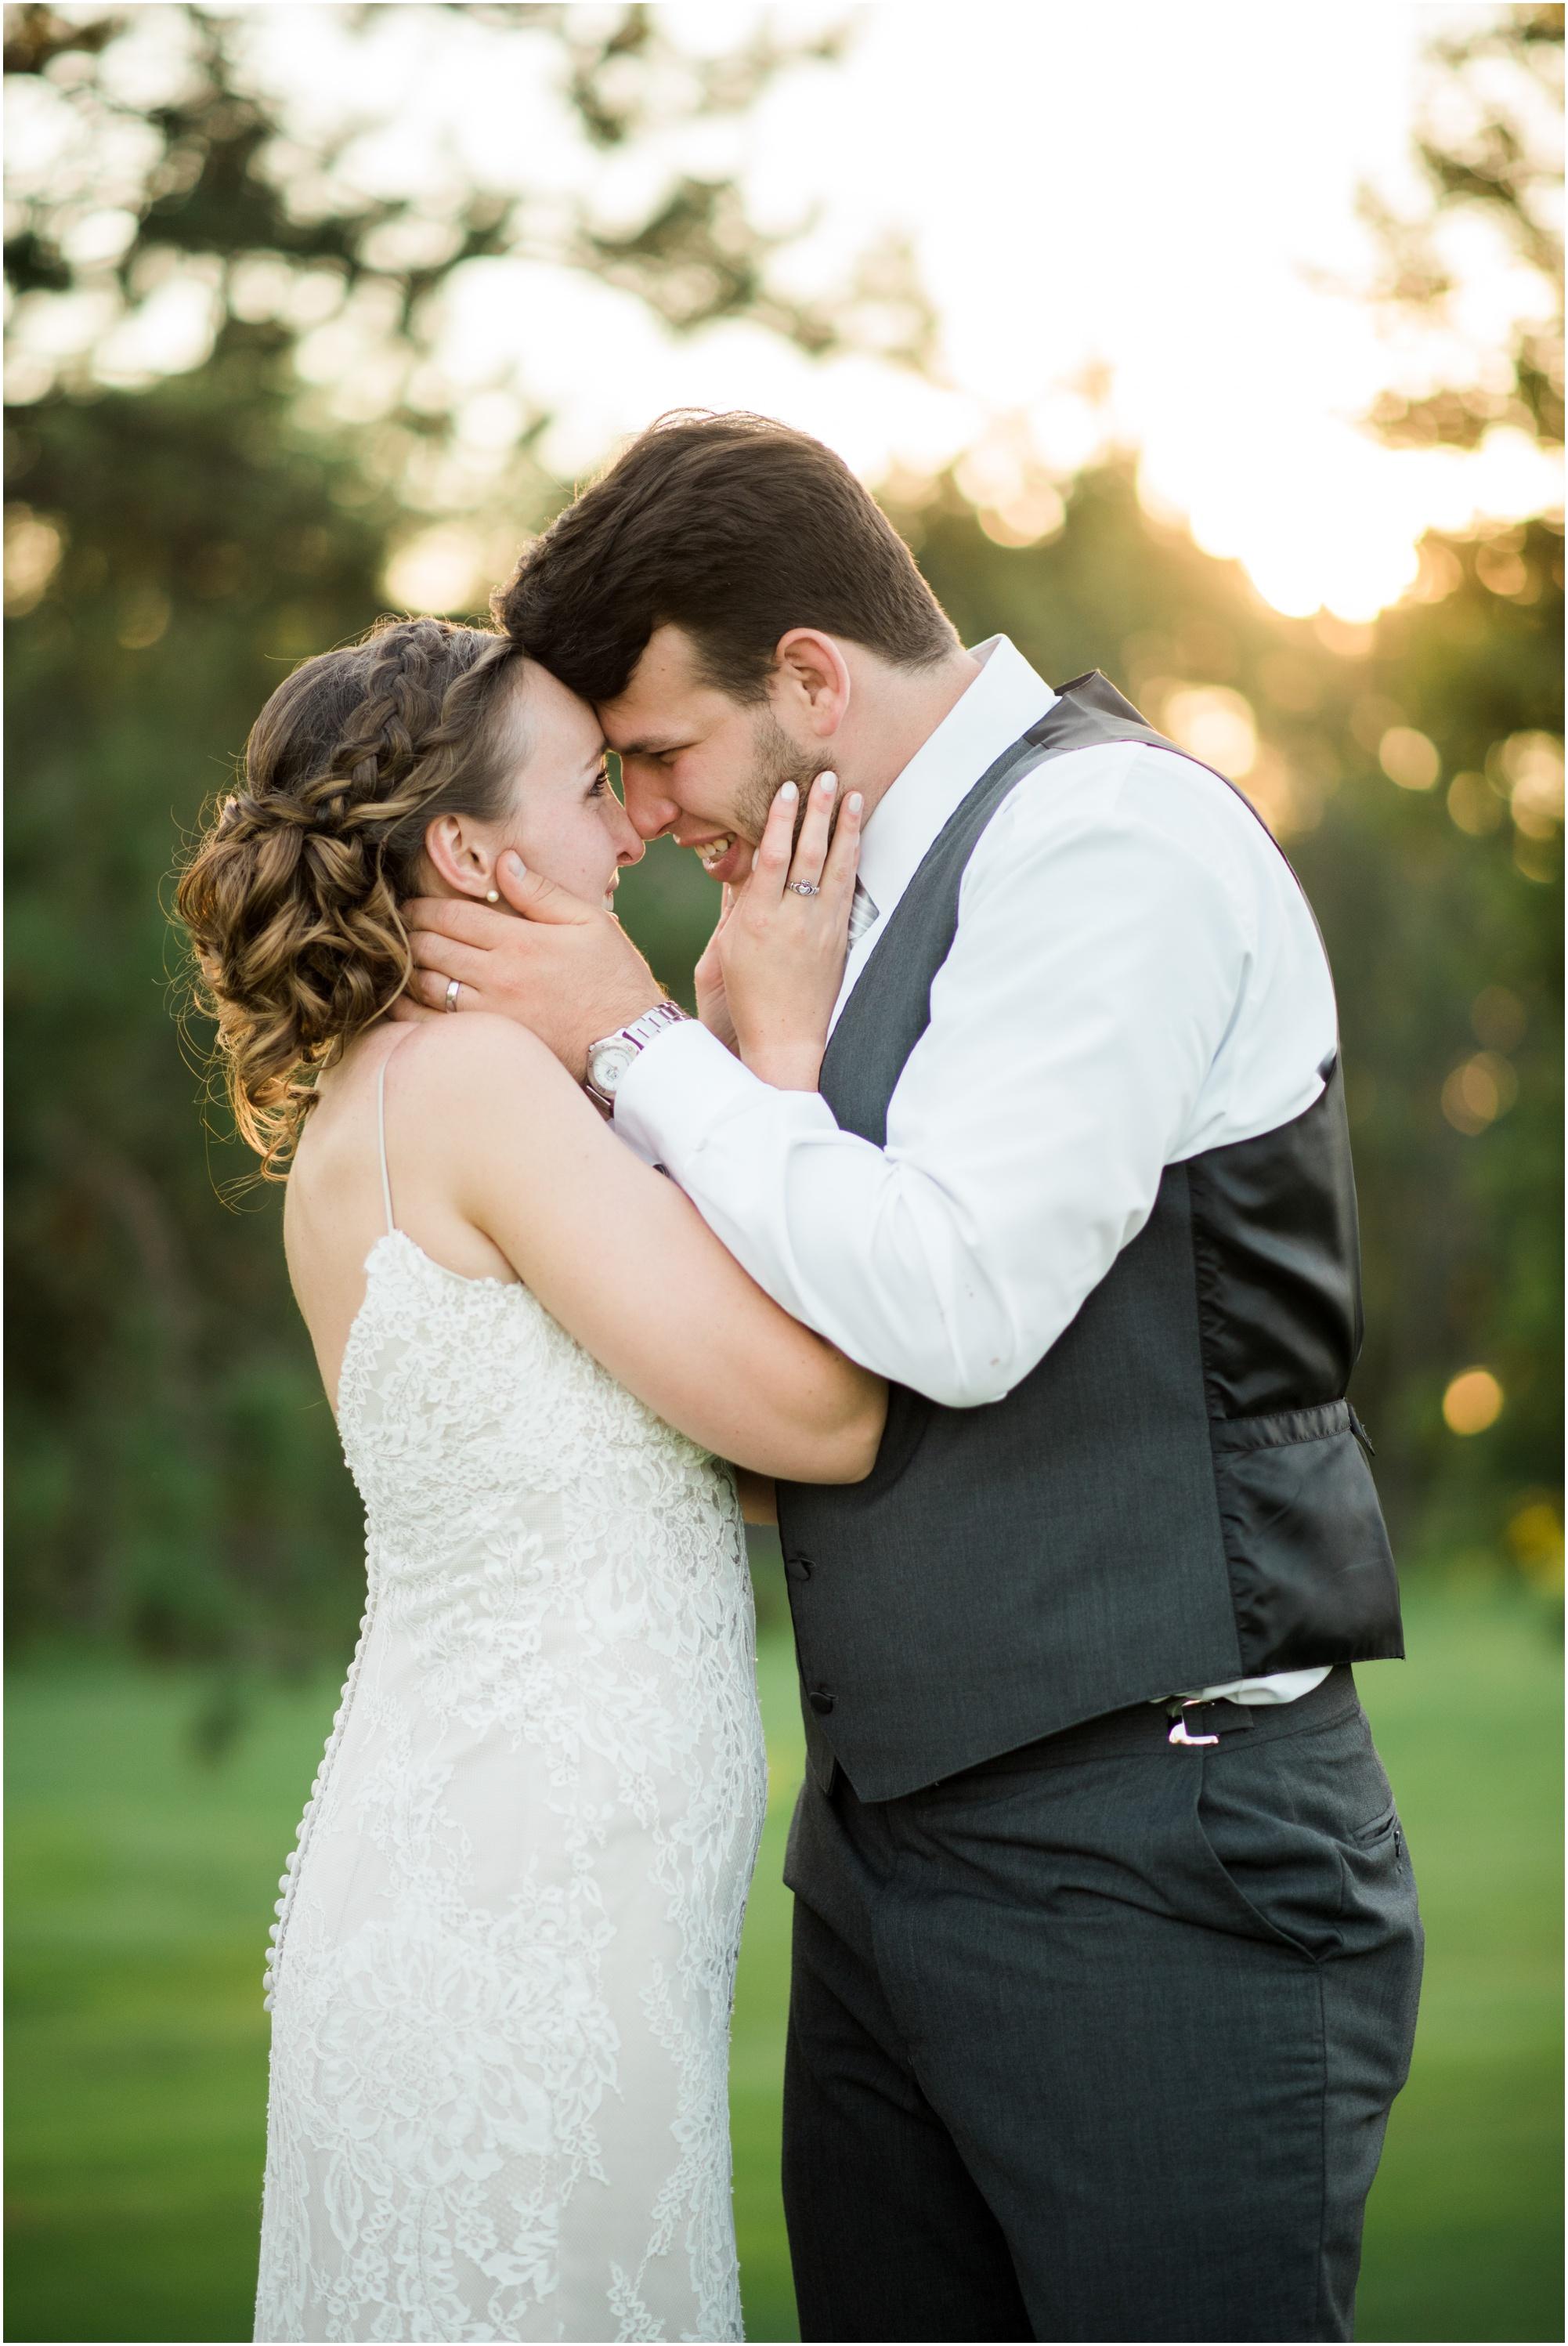 Wisconsin-Wedding-Photographer-Reedsburg-Country-Club-Kaela-and Matt-Wedding-835.jpg